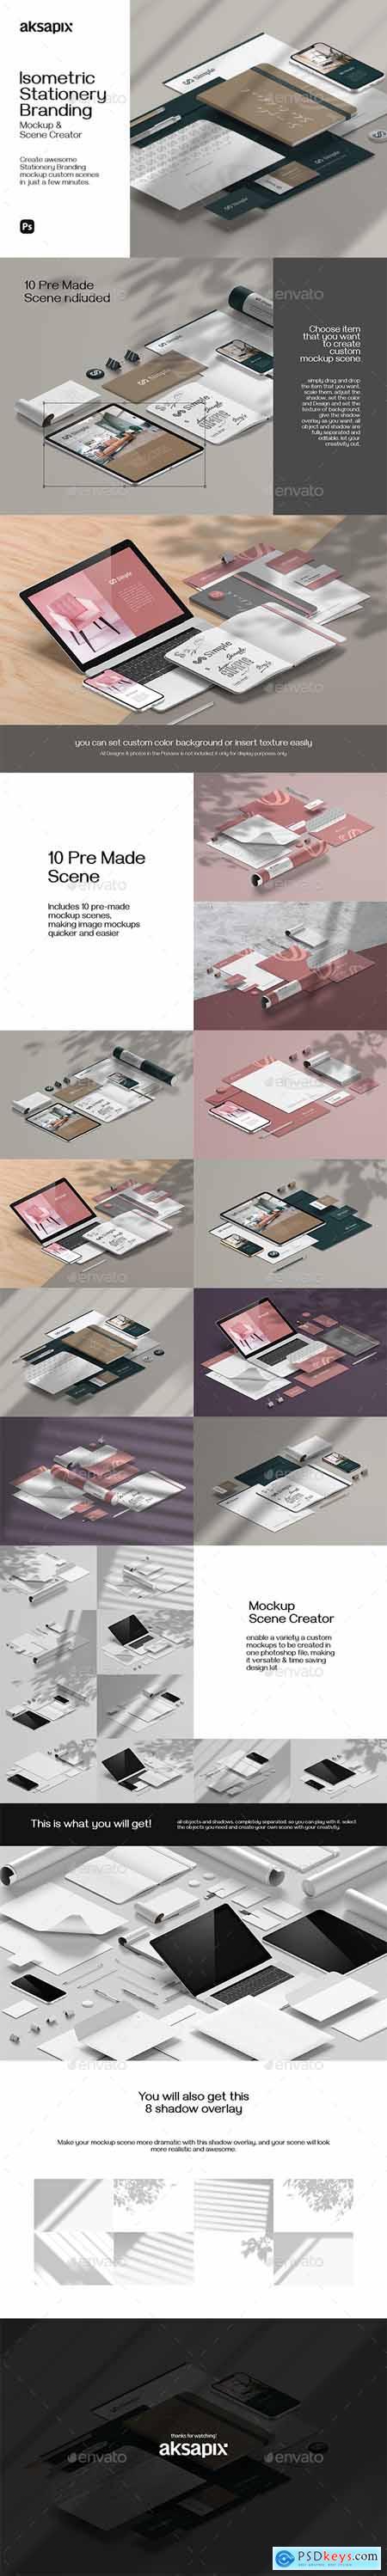 Isometric Stationery Branding - Mockup Scene Creator 30198161